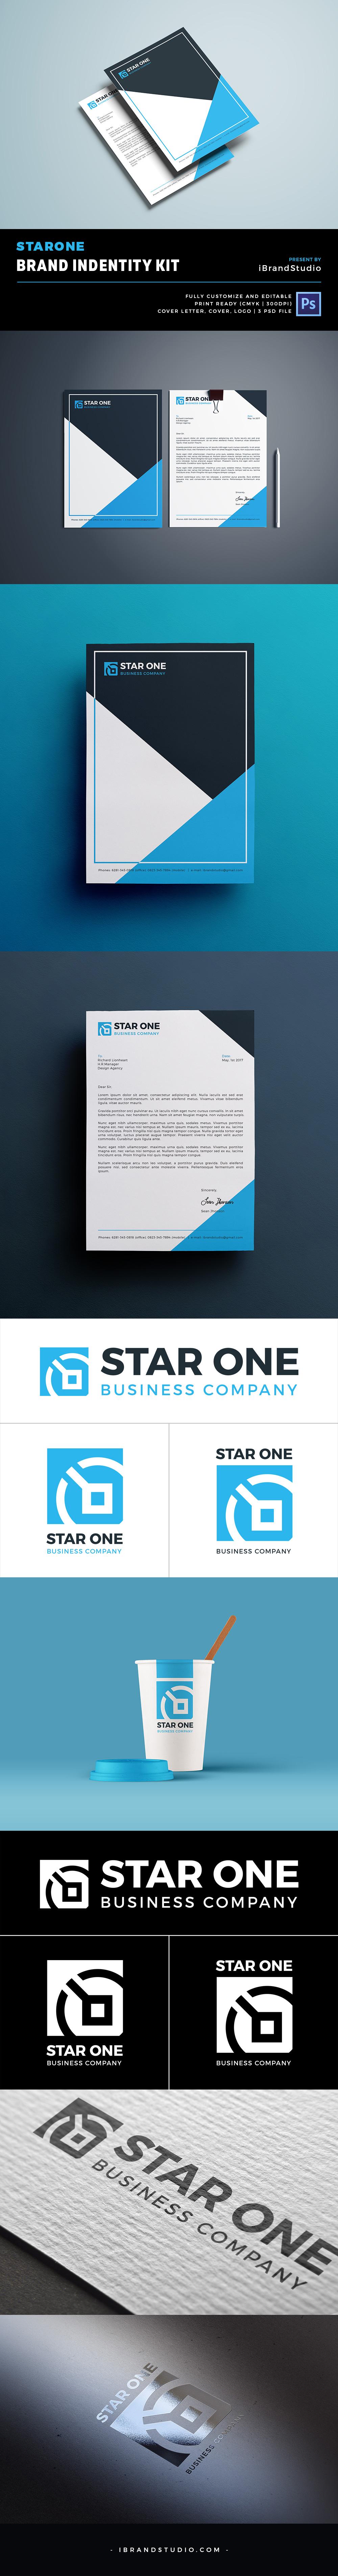 Free StarOne - Brand Identity Template